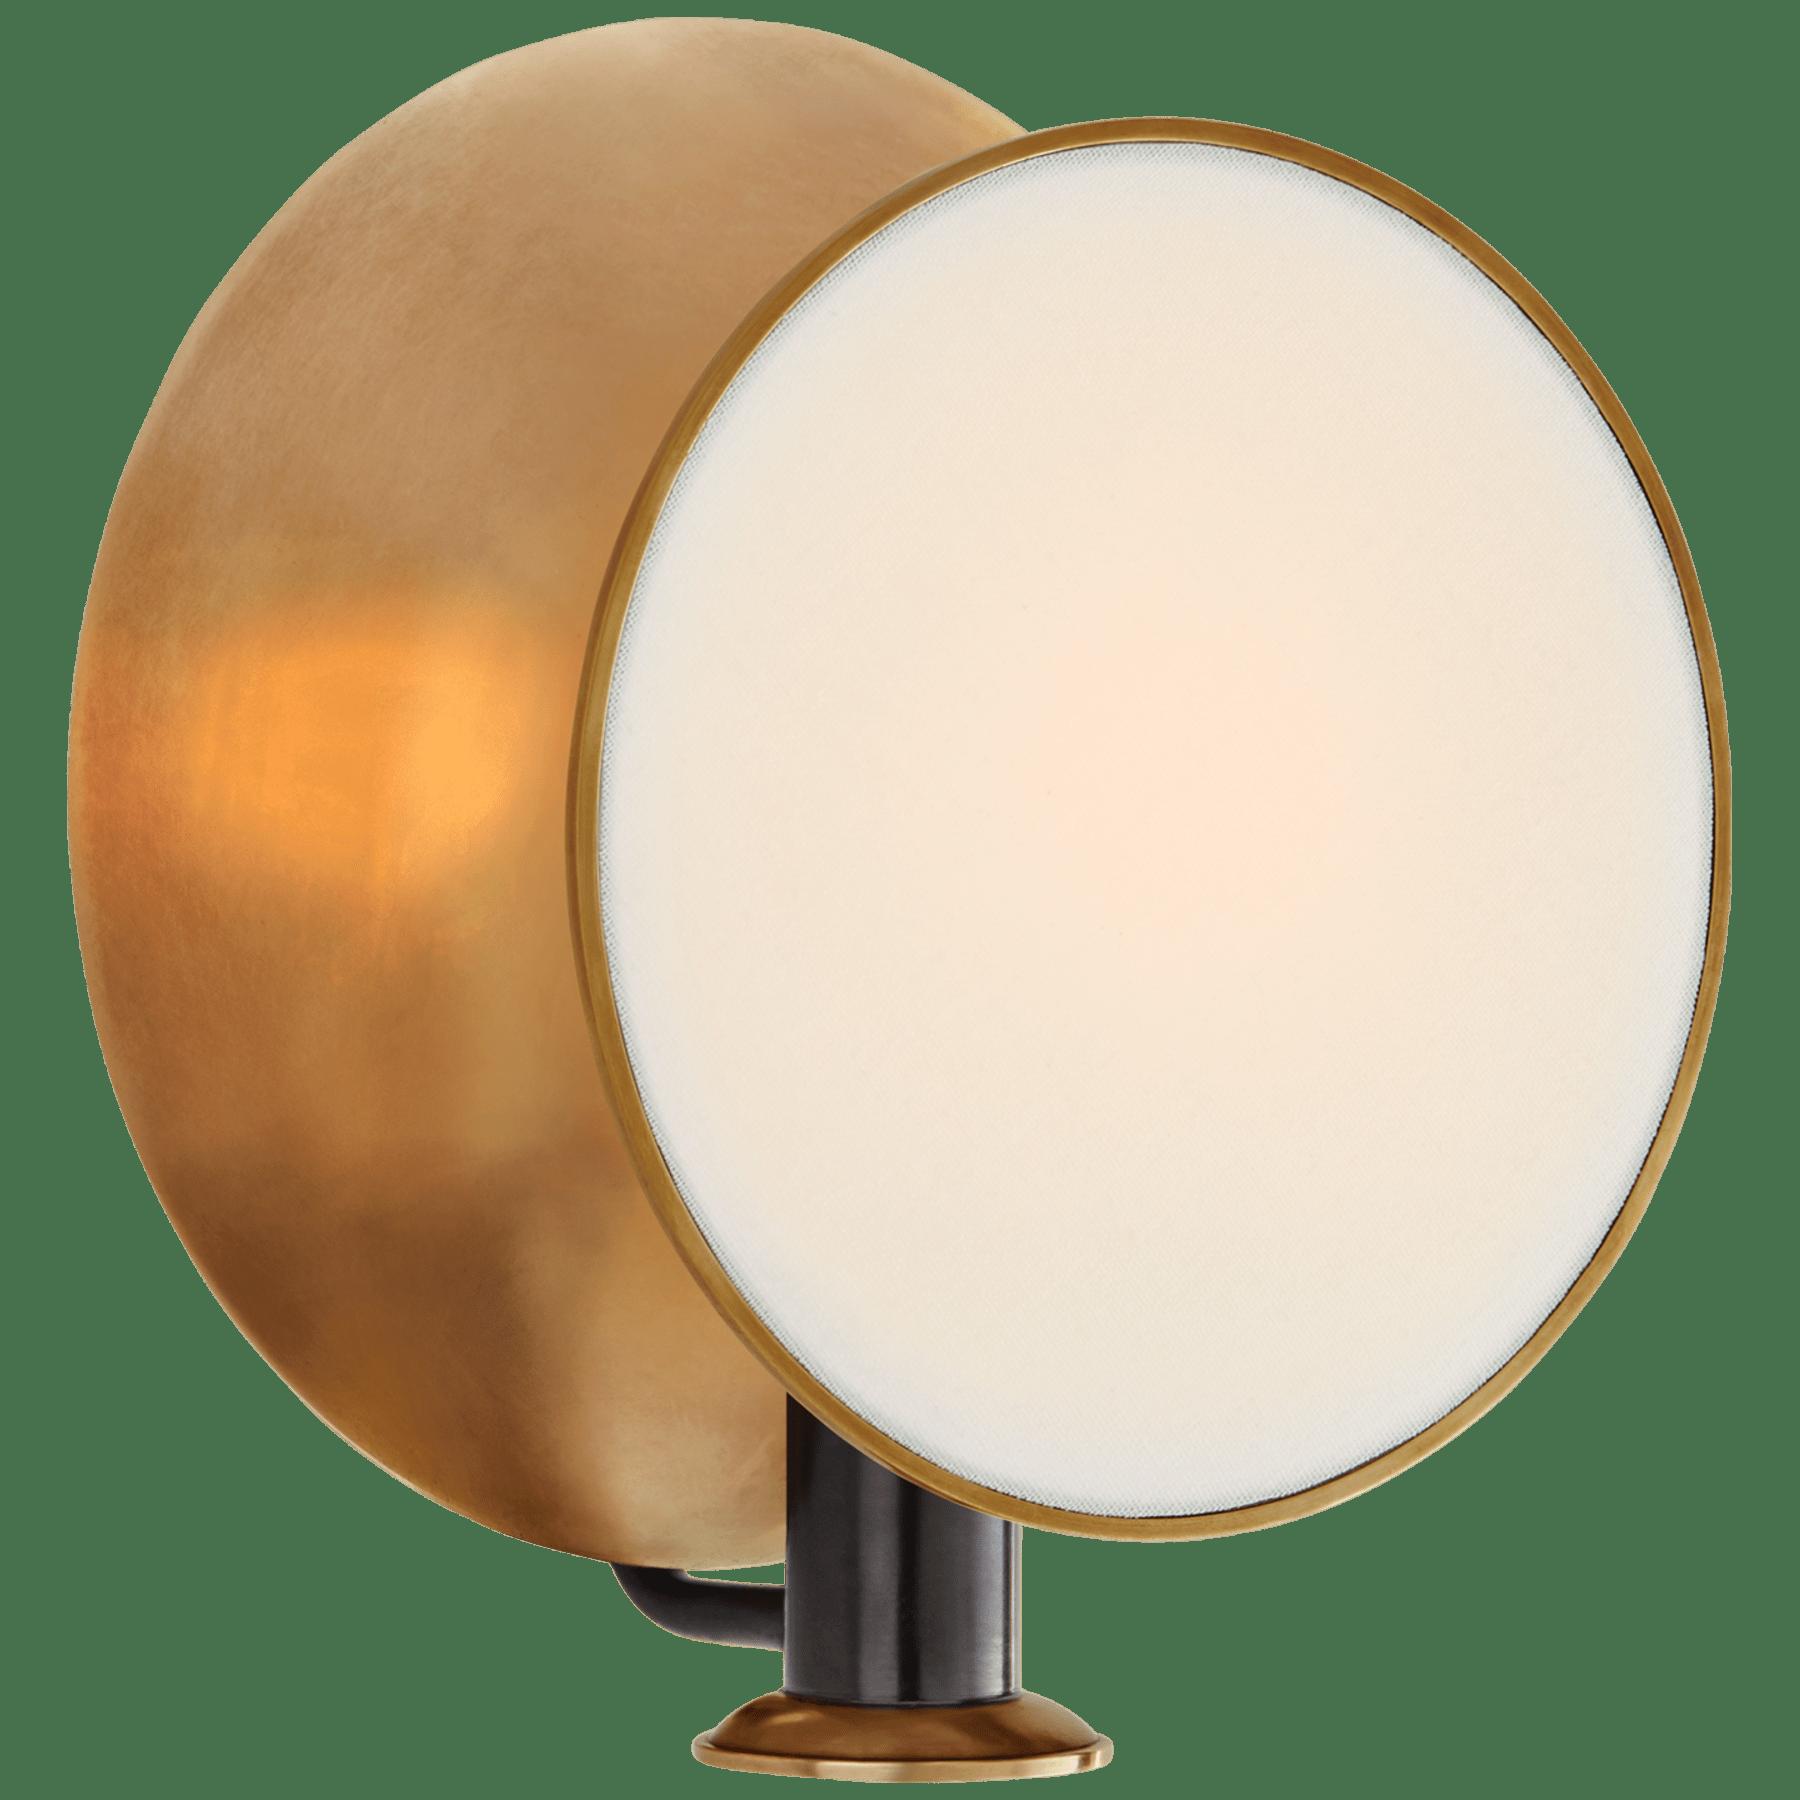 Osiris Single Reflector Sconce